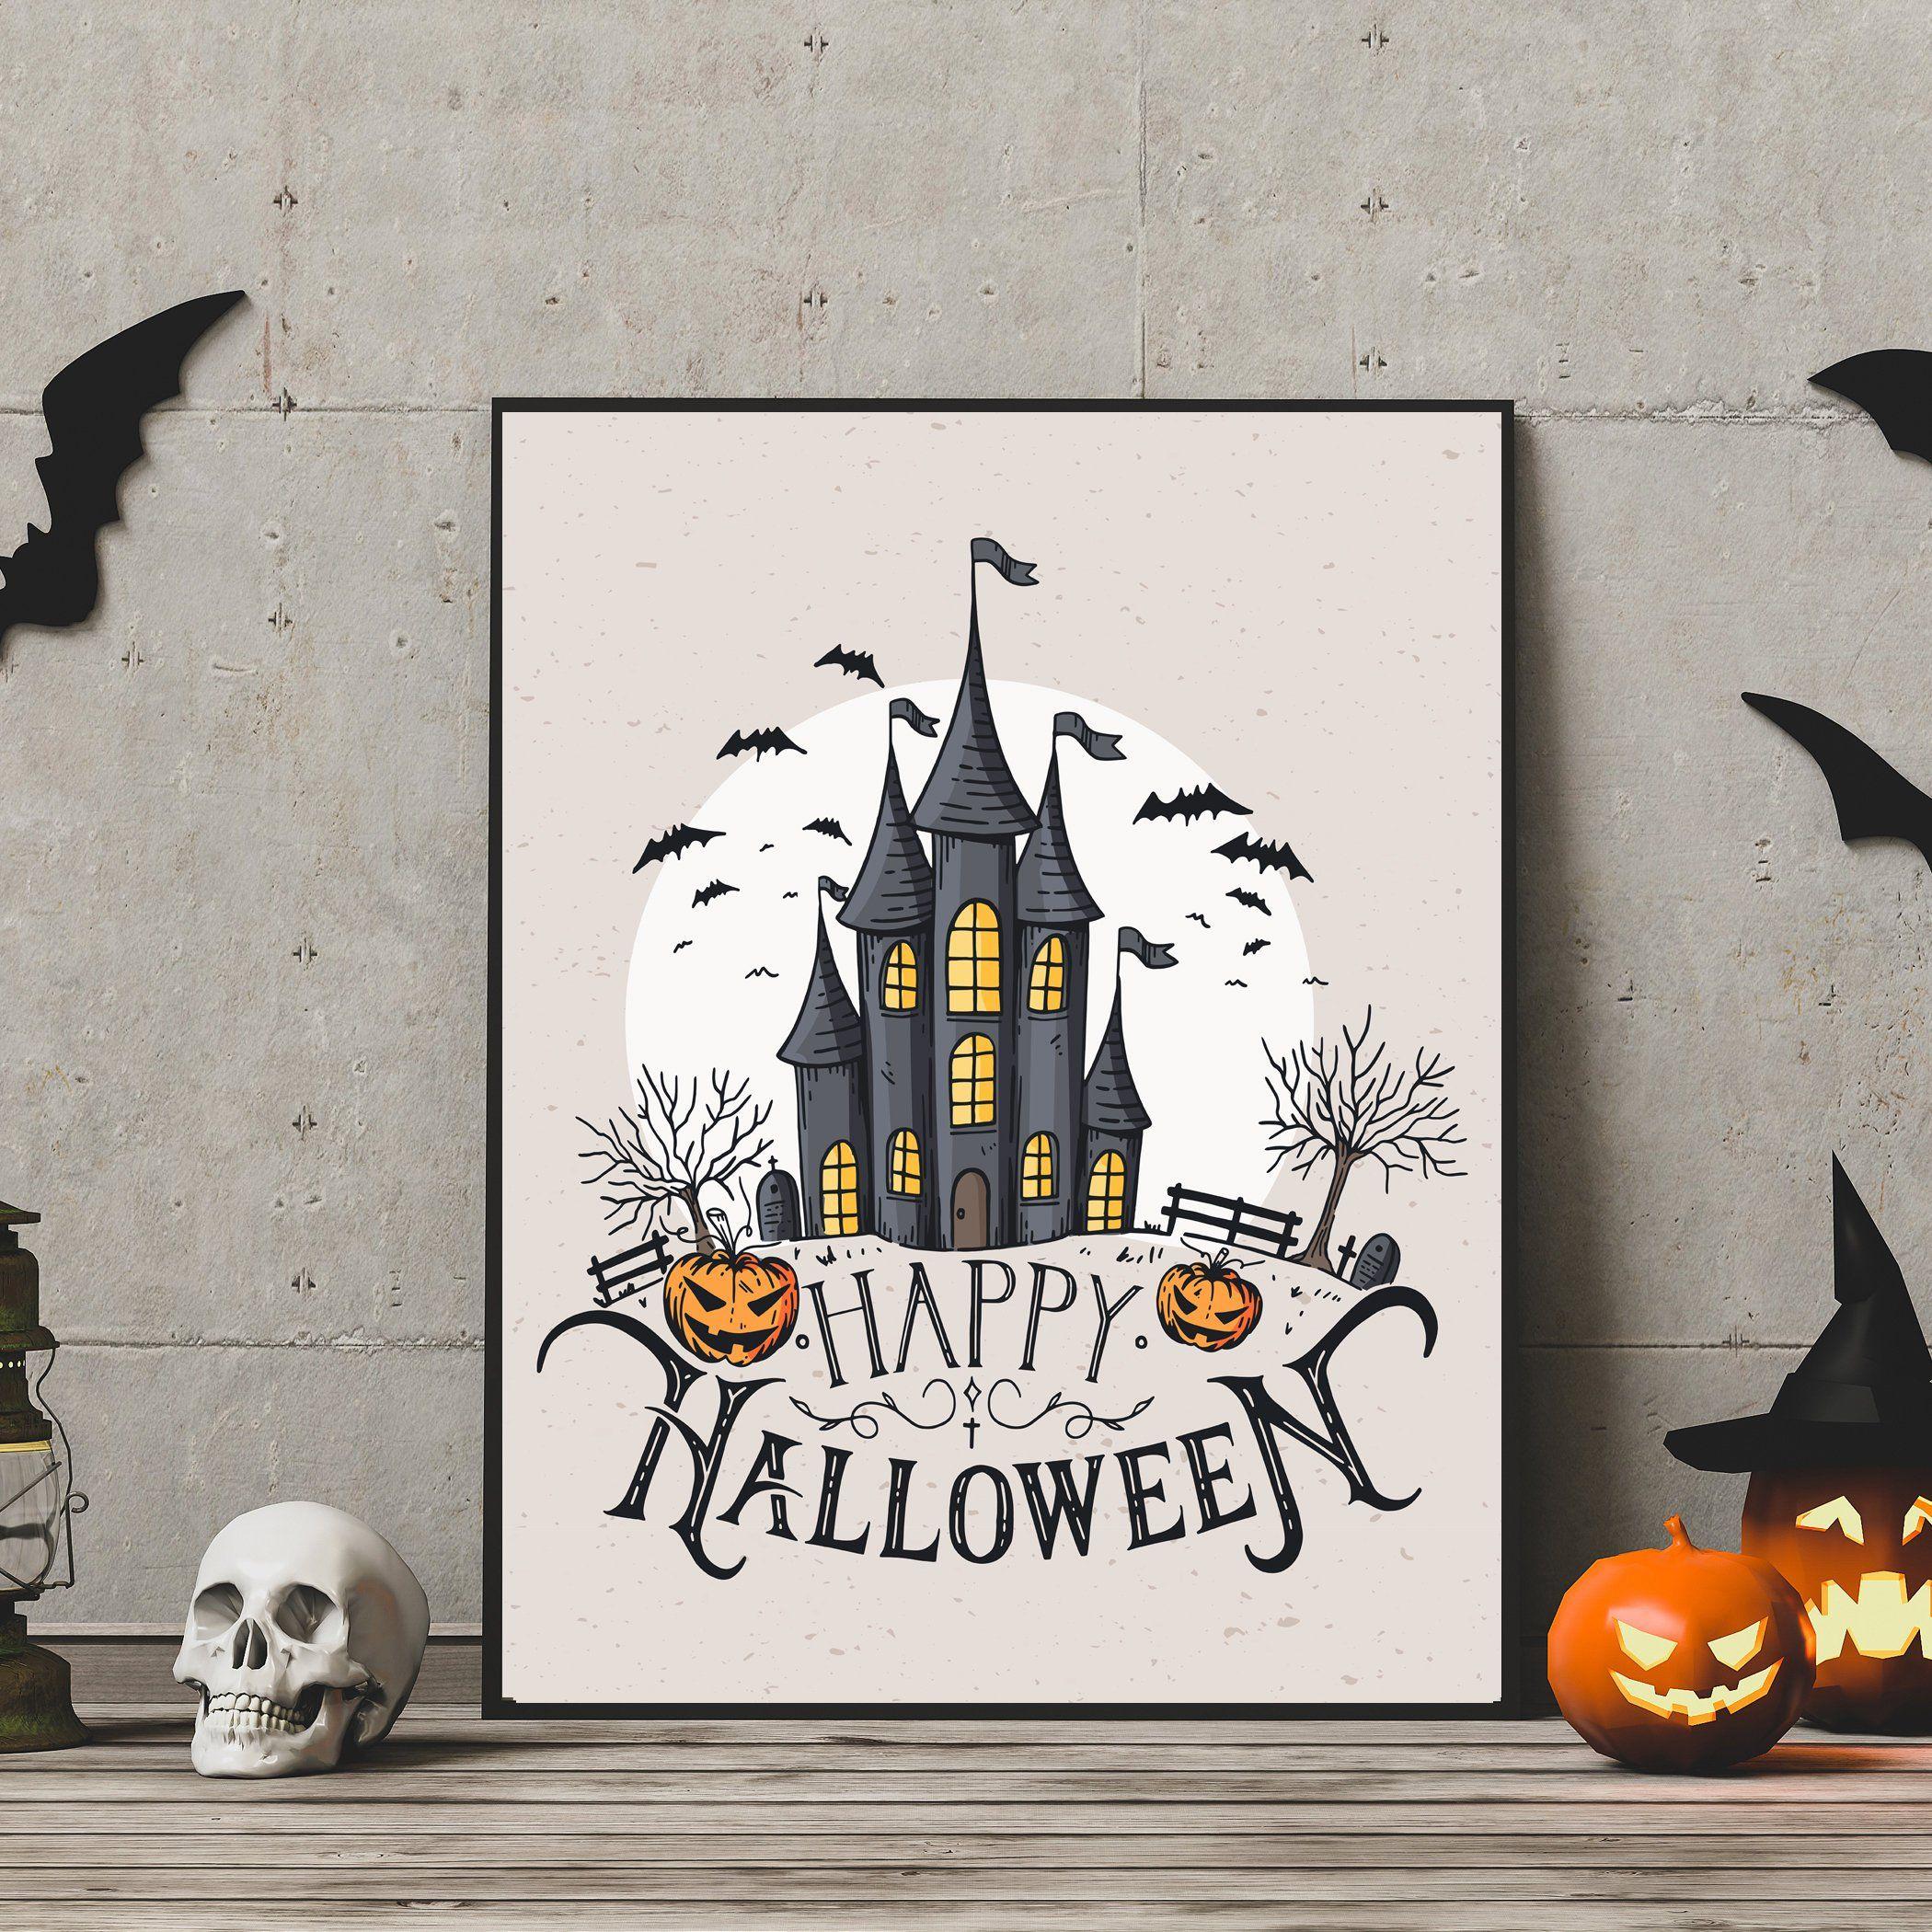 Happy Halloween Print Halloween Party Poster Halloween Party